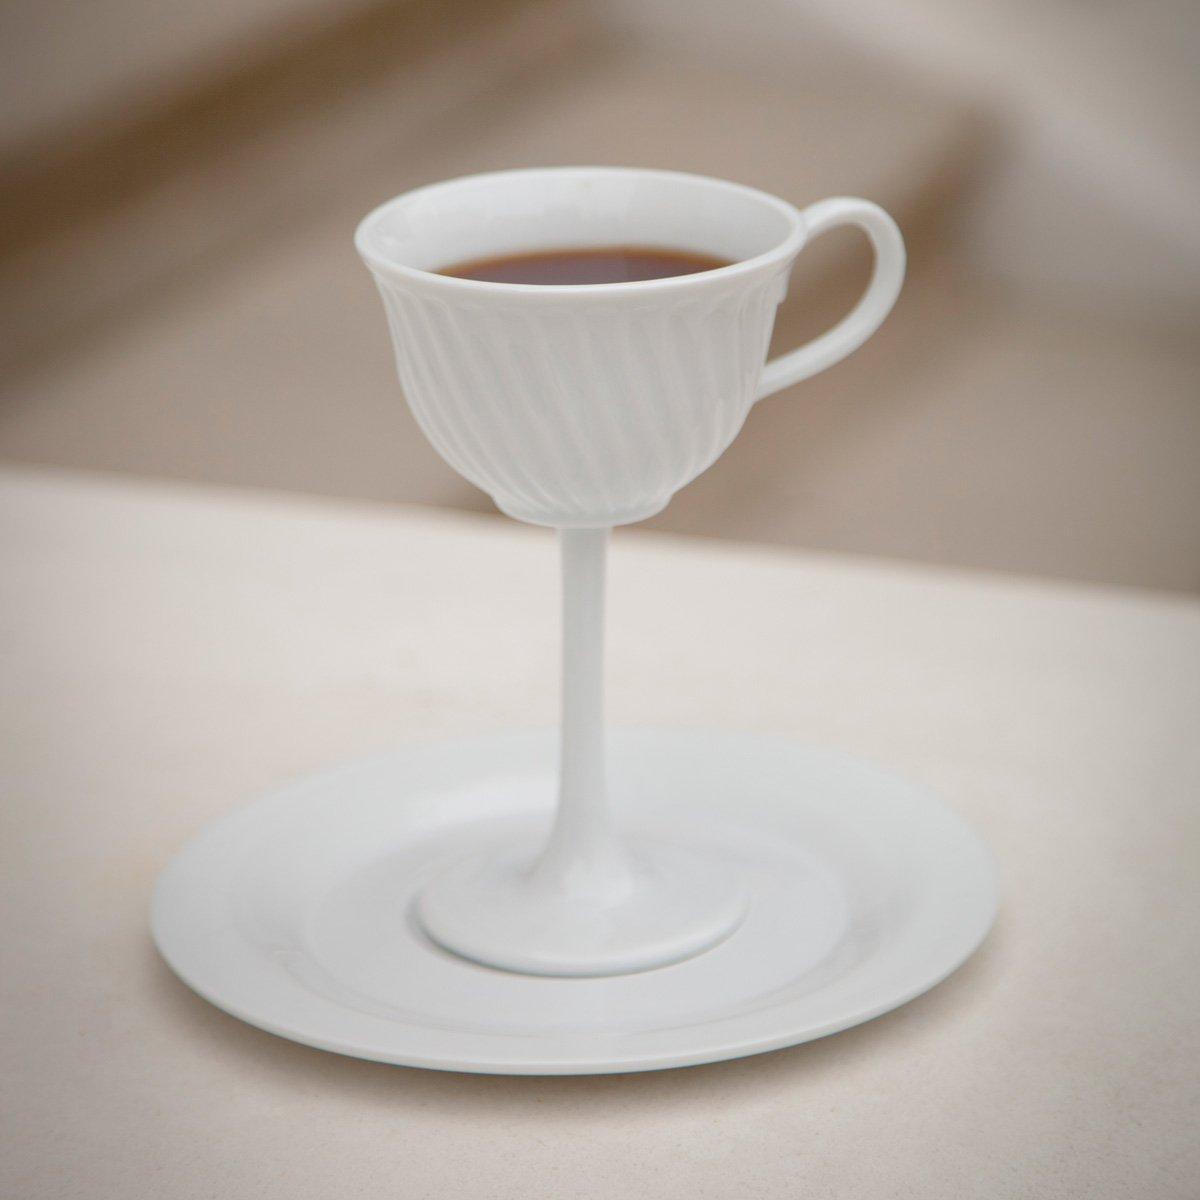 High Tea - Oversized Ceramic Tea Cup Stemware - The Green Head